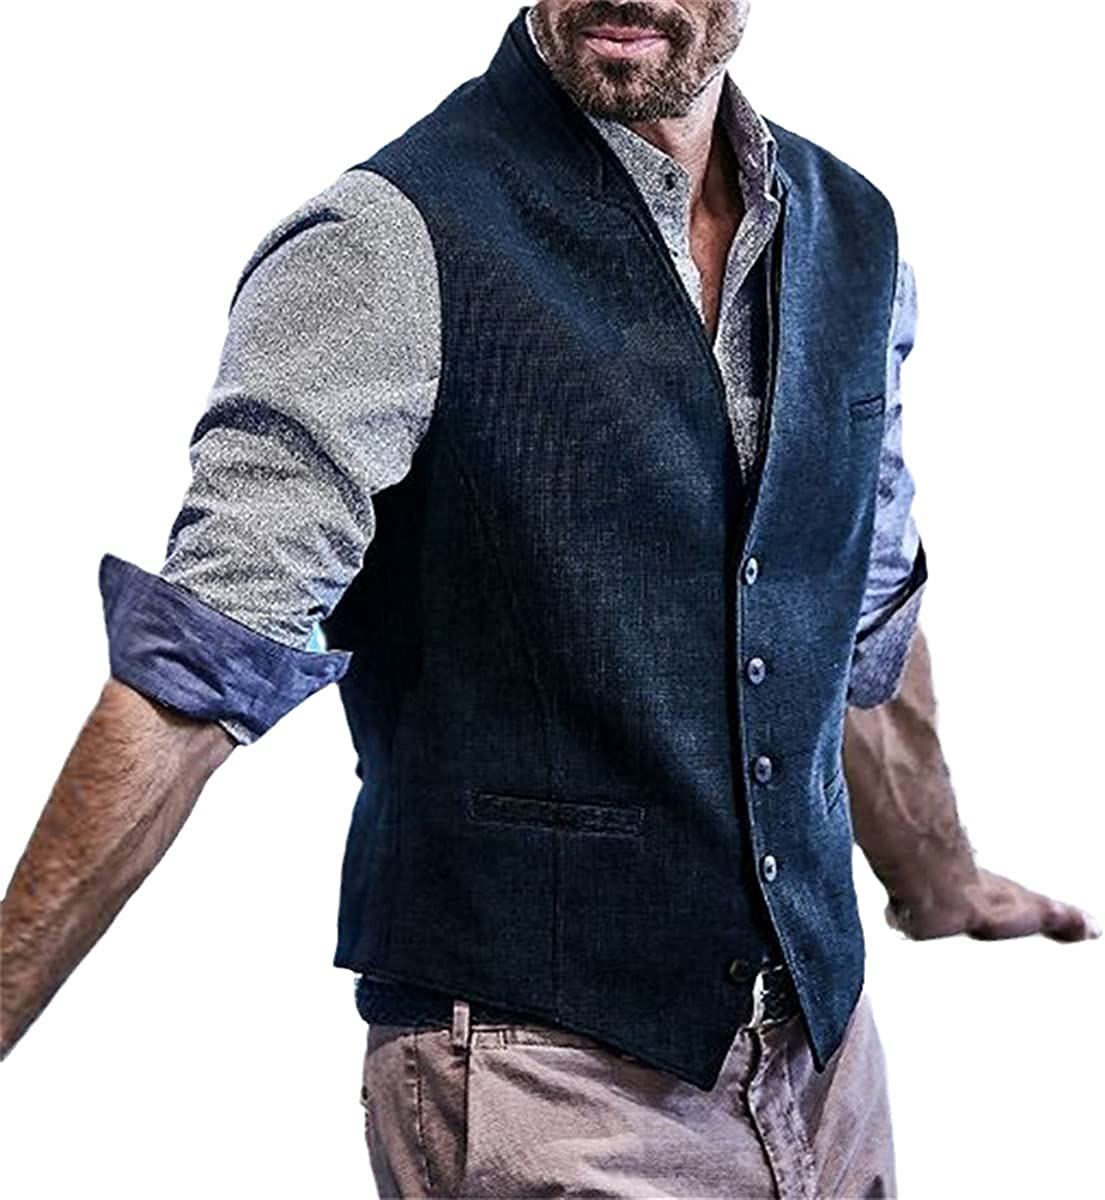 Men's Slim Herringbone Tweed Suit Vest Wool Blend Vest Fashion Single-breasted Notch Lapel Vest Jacket